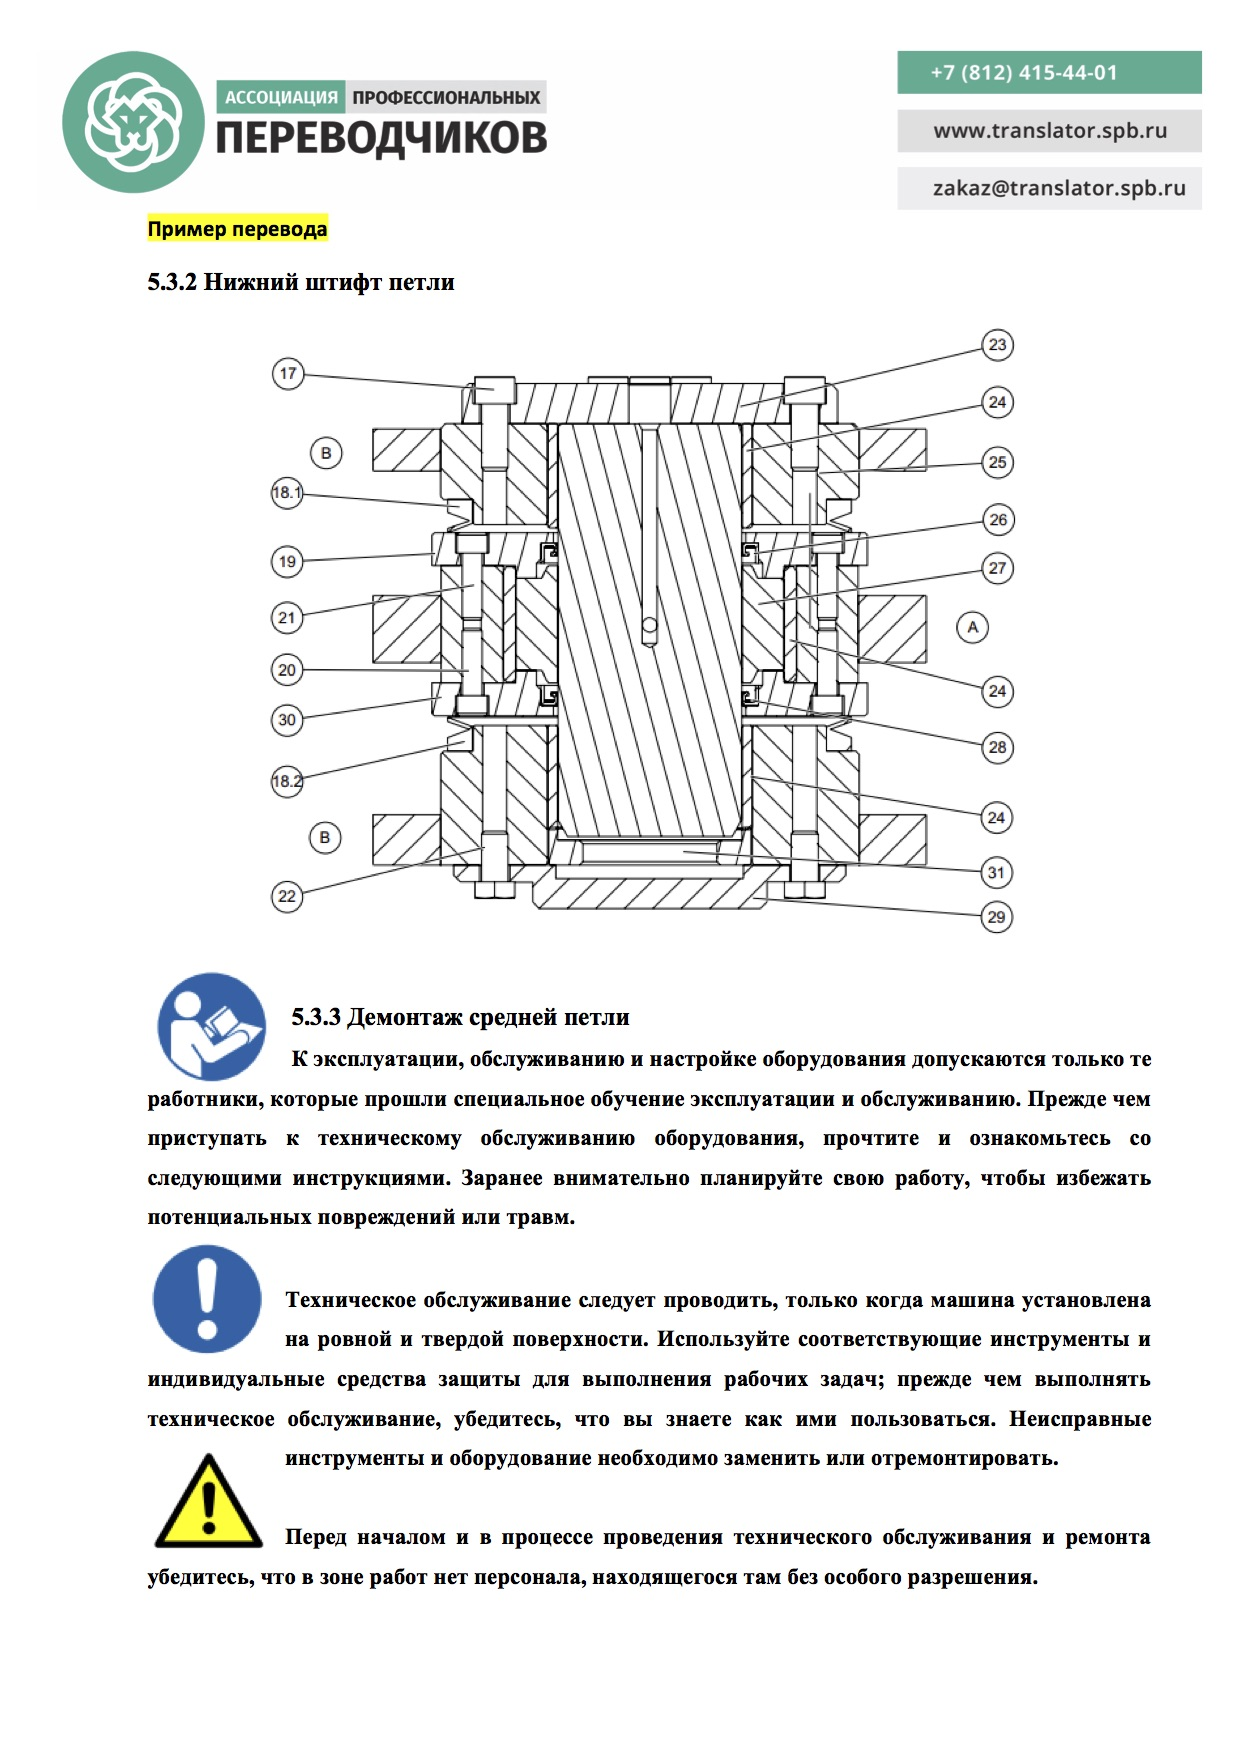 testovyi-perevod-1